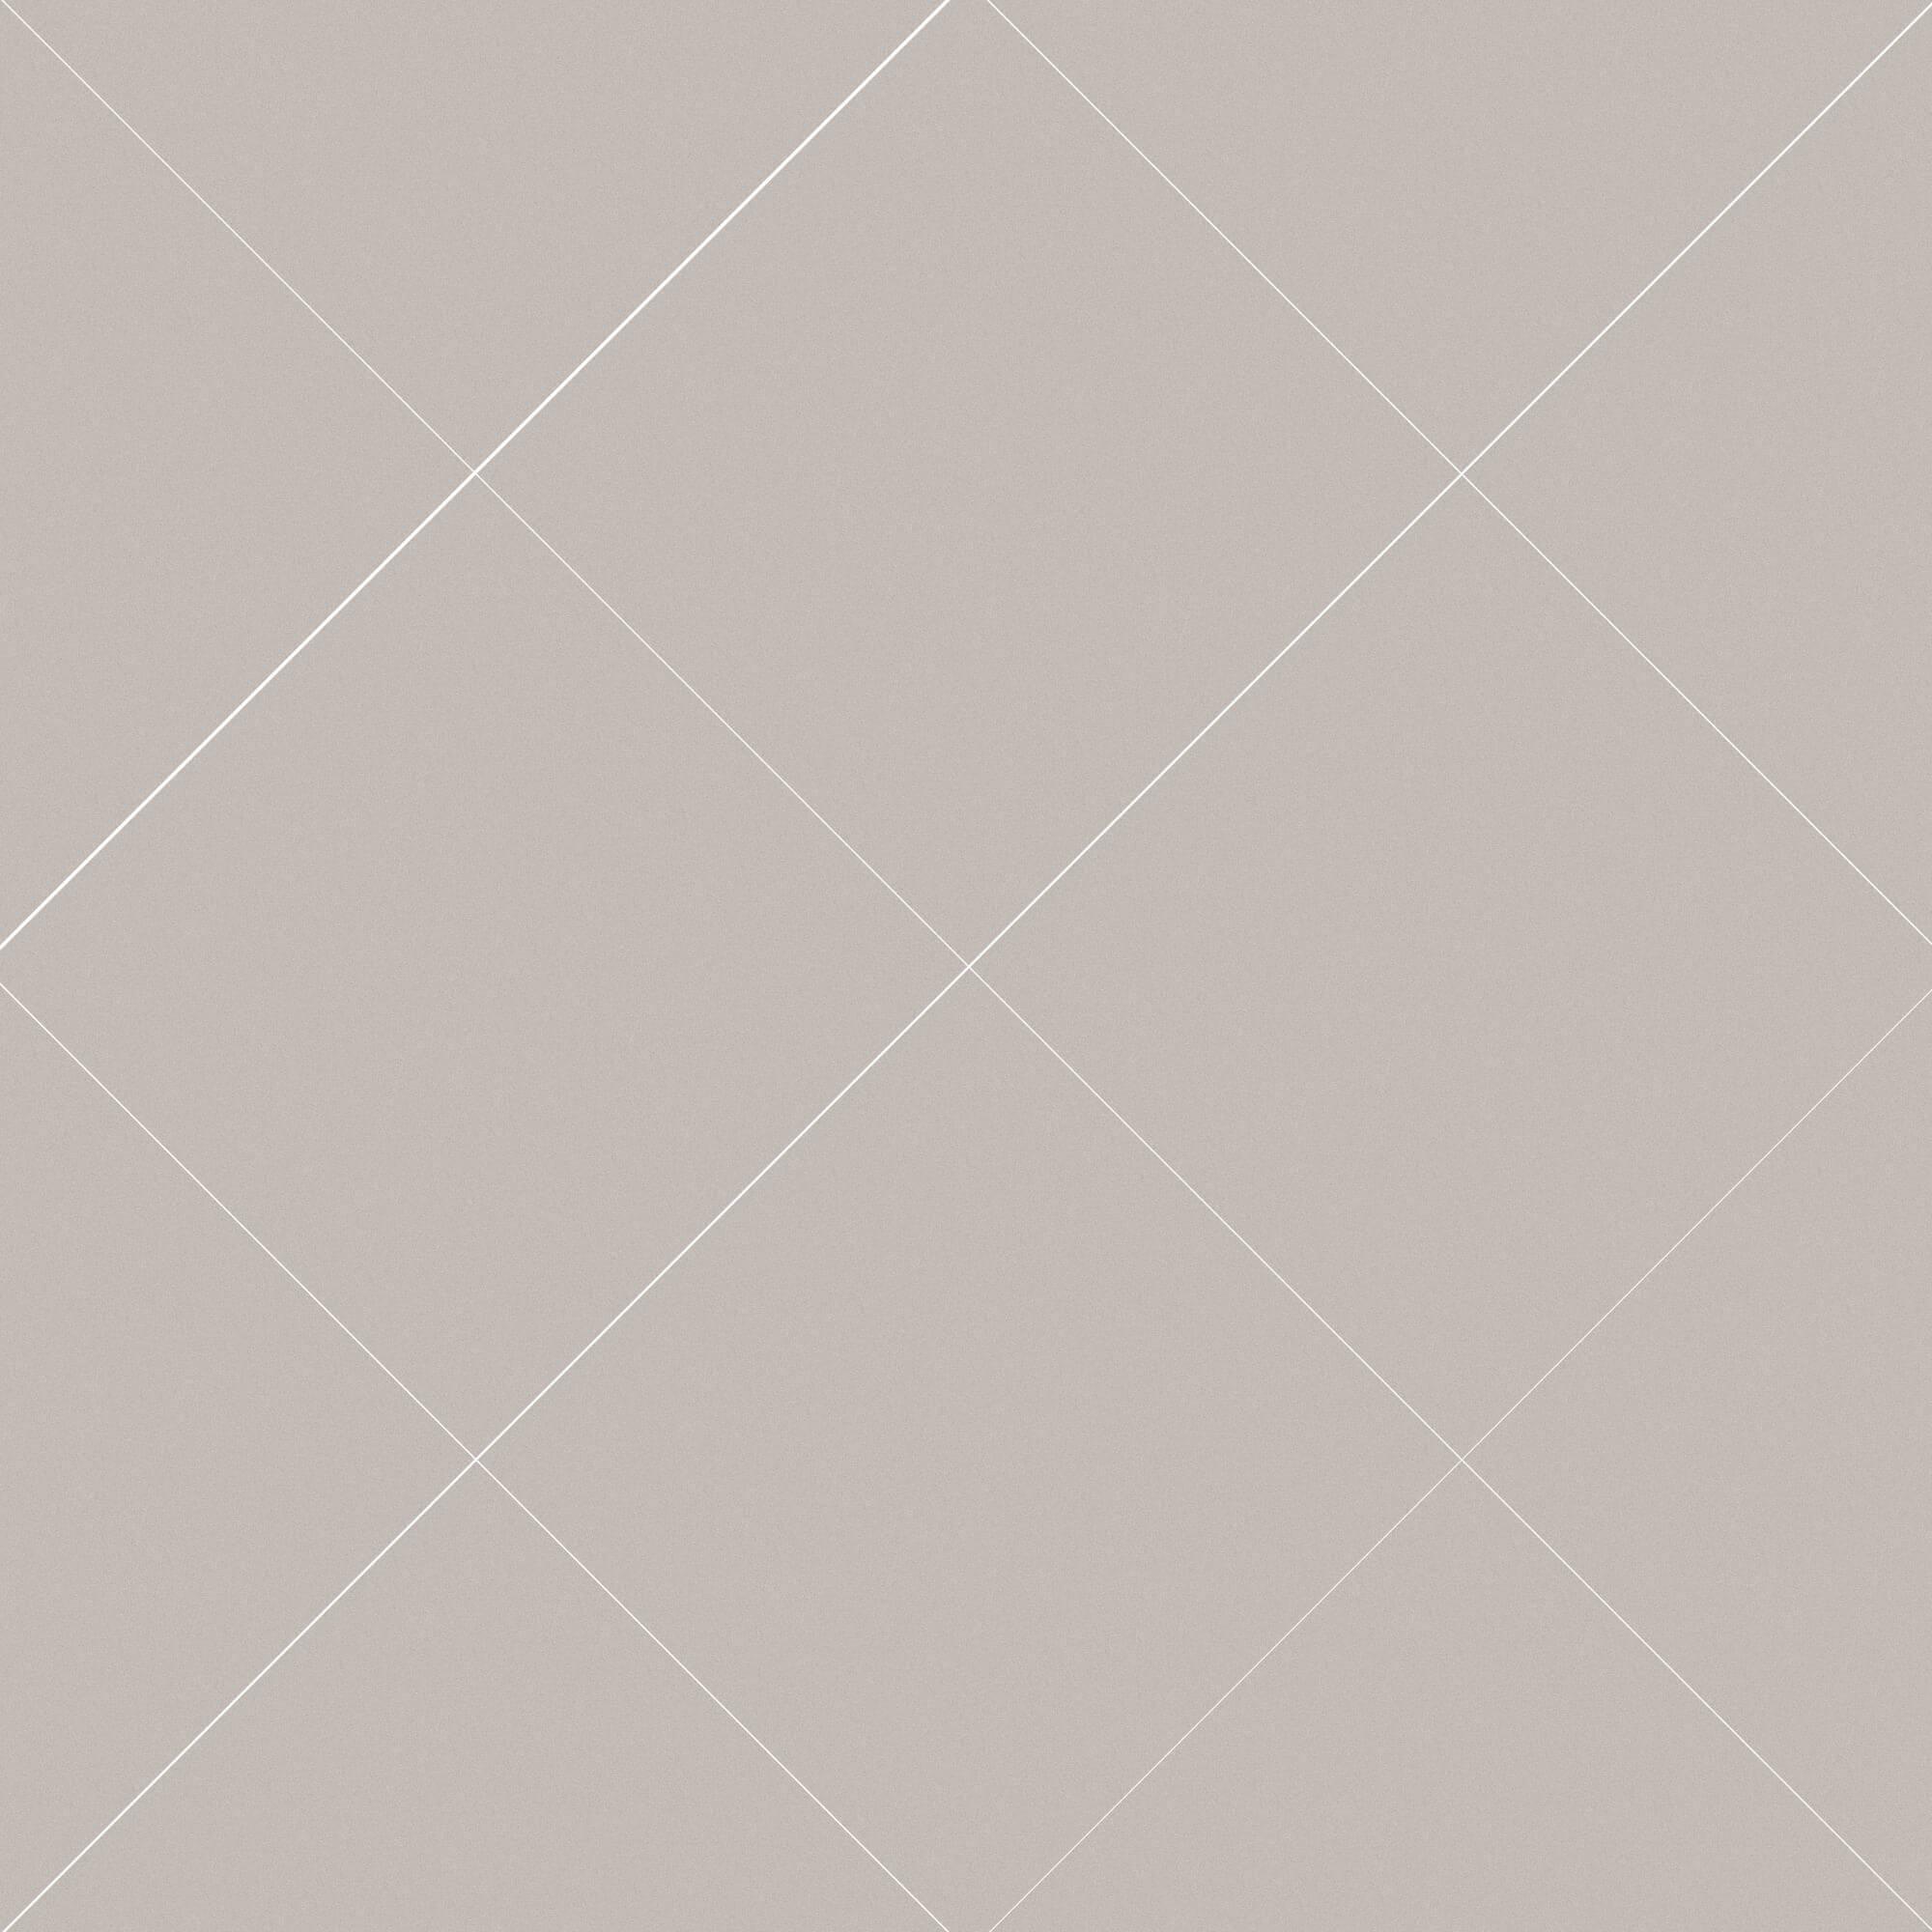 Carrelage sol et mur aspect carreau ciment taupe uni Barcelona Piedra 25x25 cm